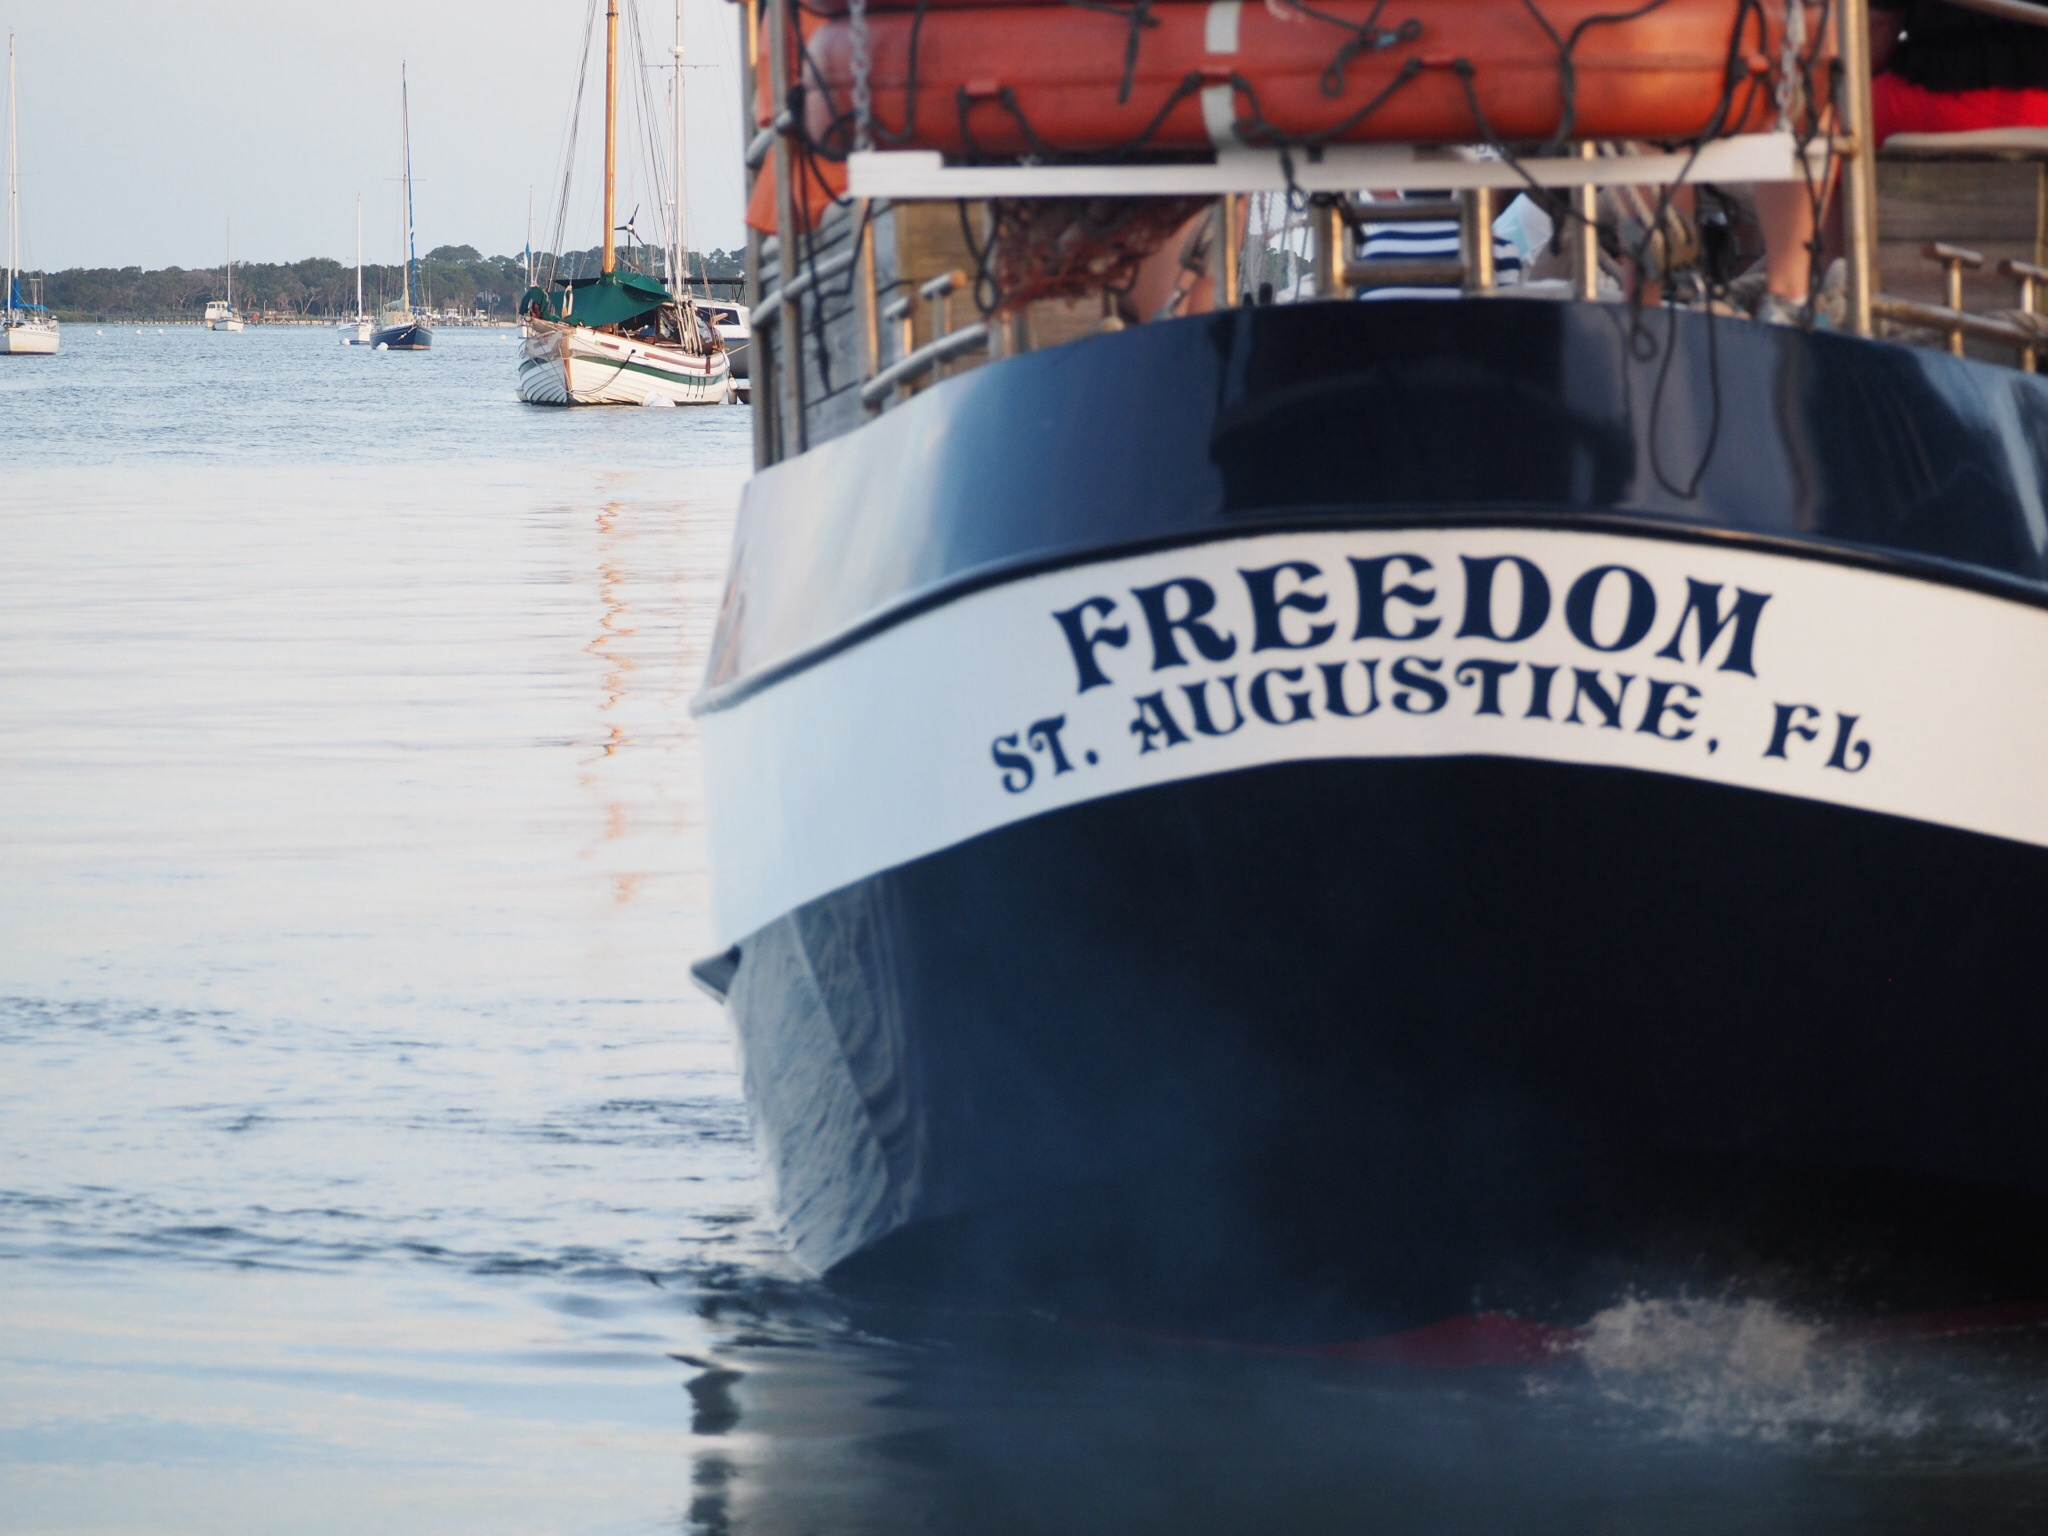 The good ship Freedom